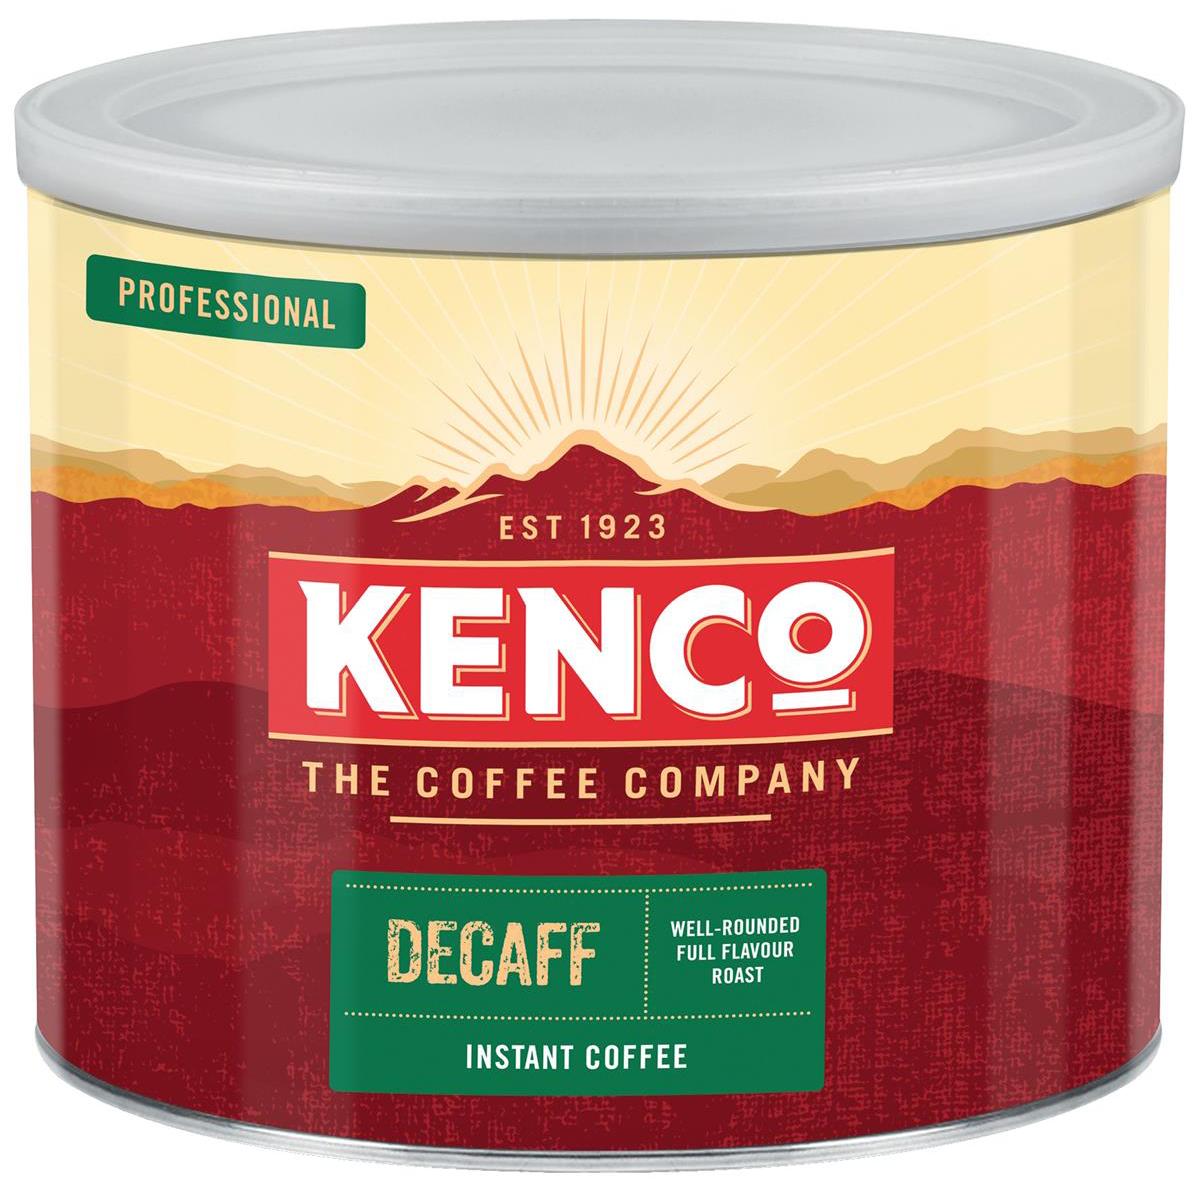 Kenco Decaffeinated Instant Coffee Tin 500g Ref 4032079